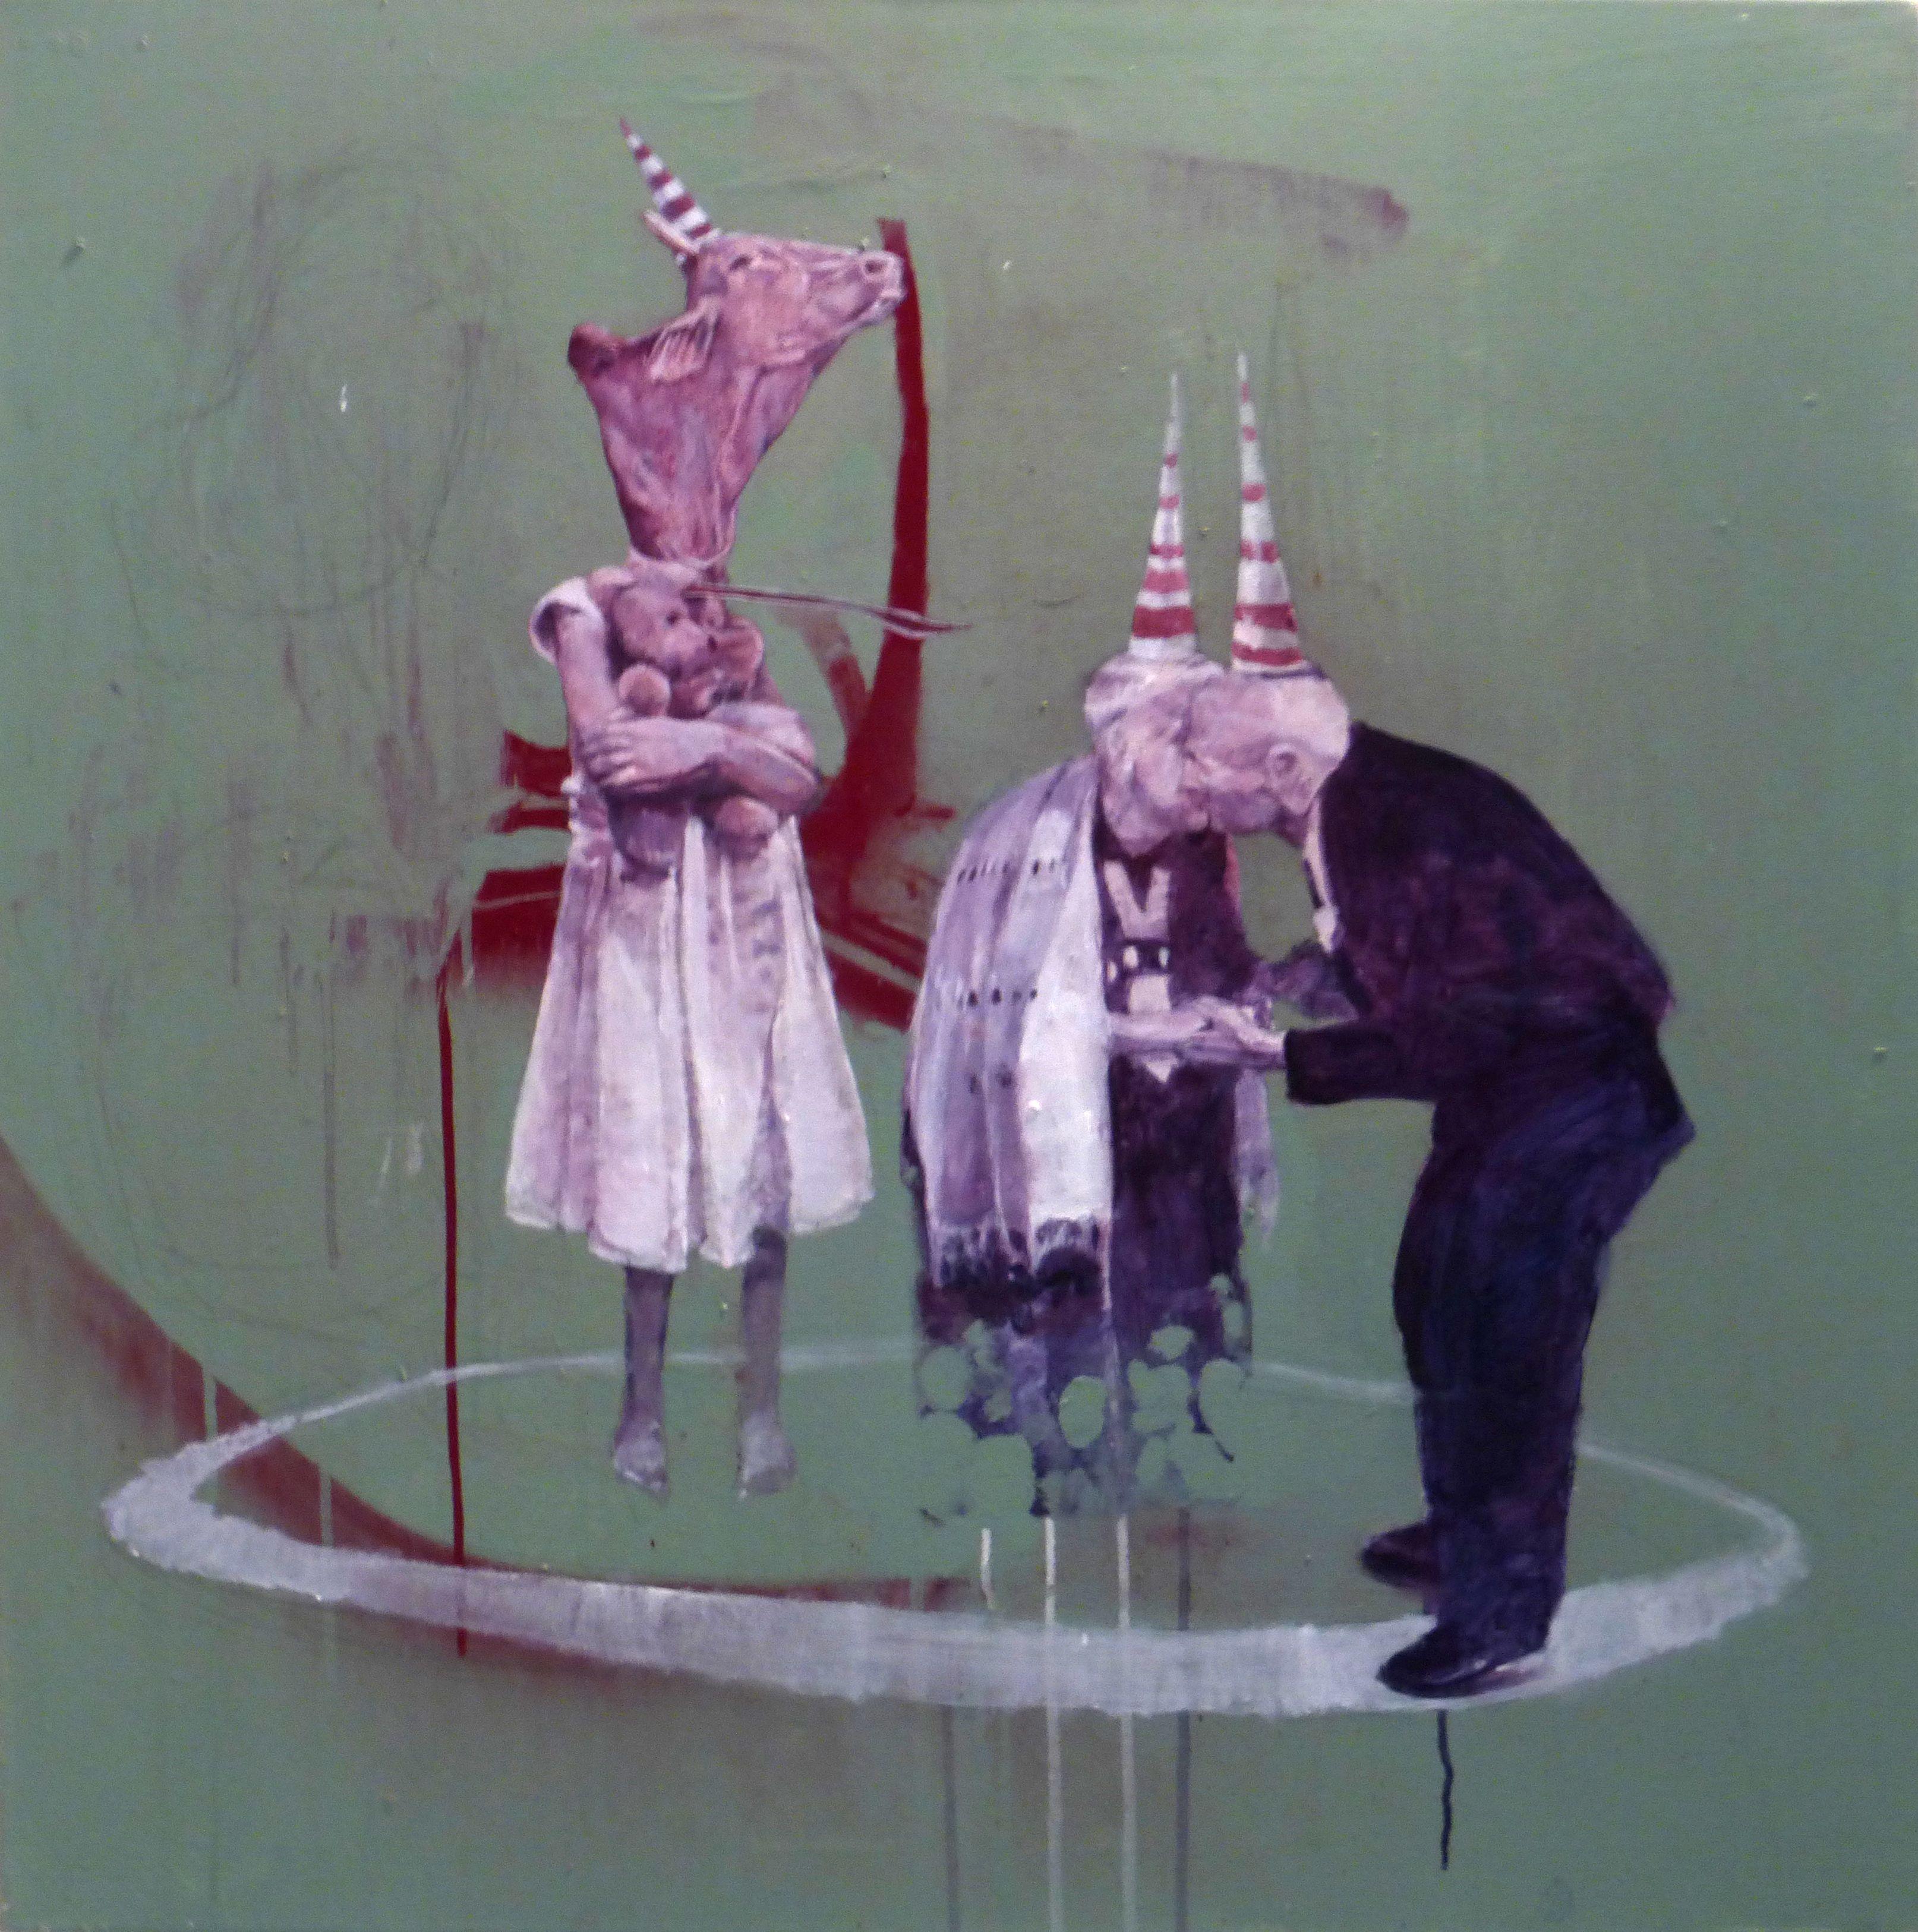 Alex Produkt - End Orphans